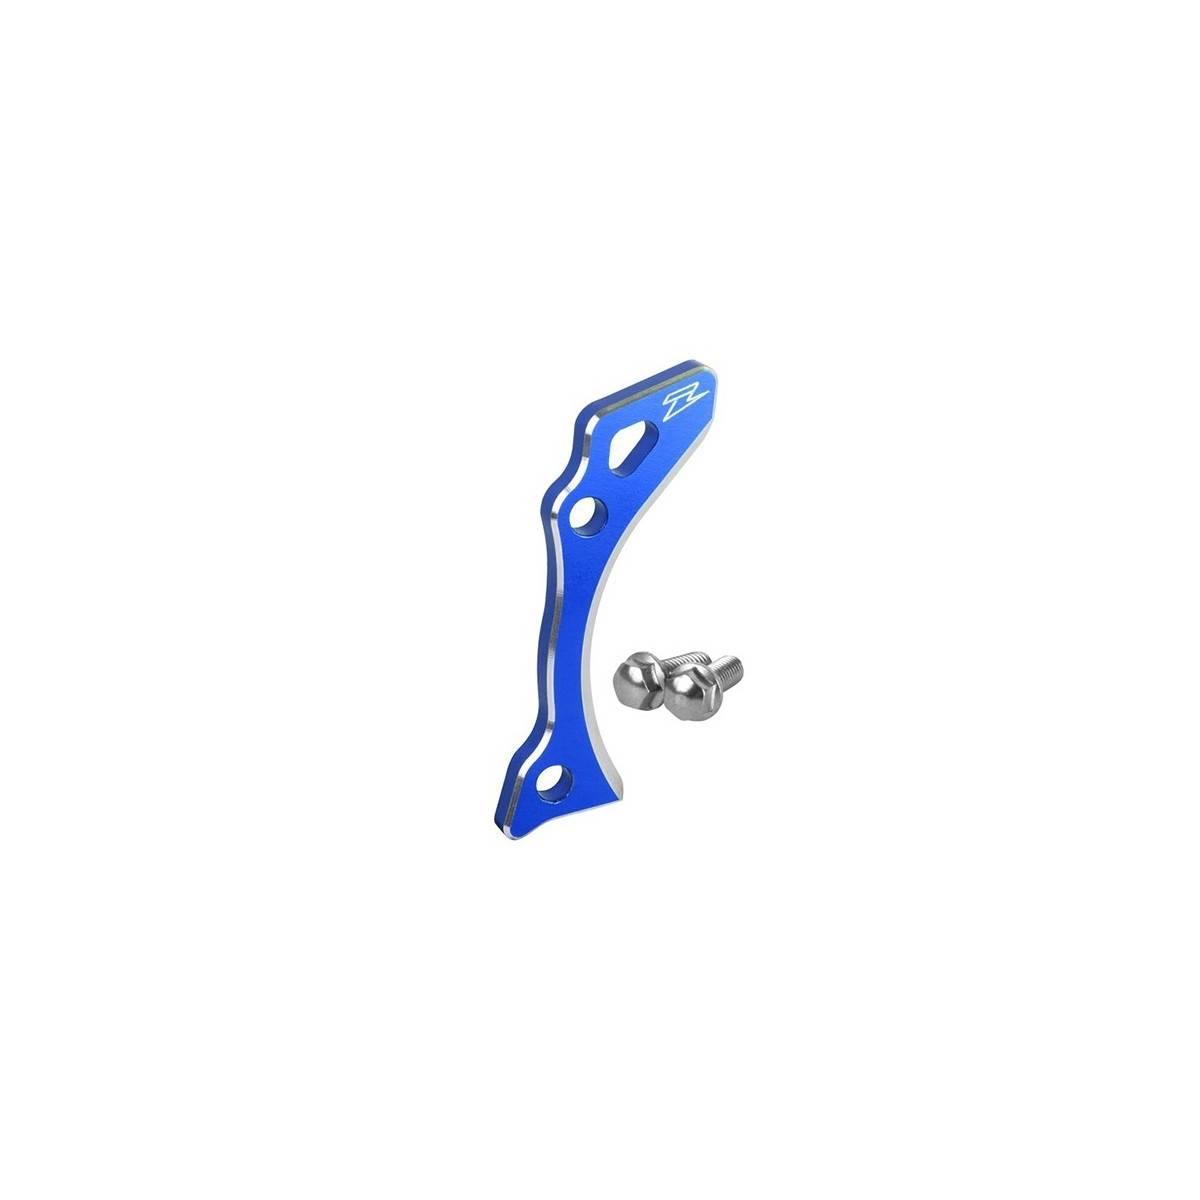 ZE80.7326 - Protector Caja Zeta Yz250F Fx´14-, Yz450F Fx´14-Azul